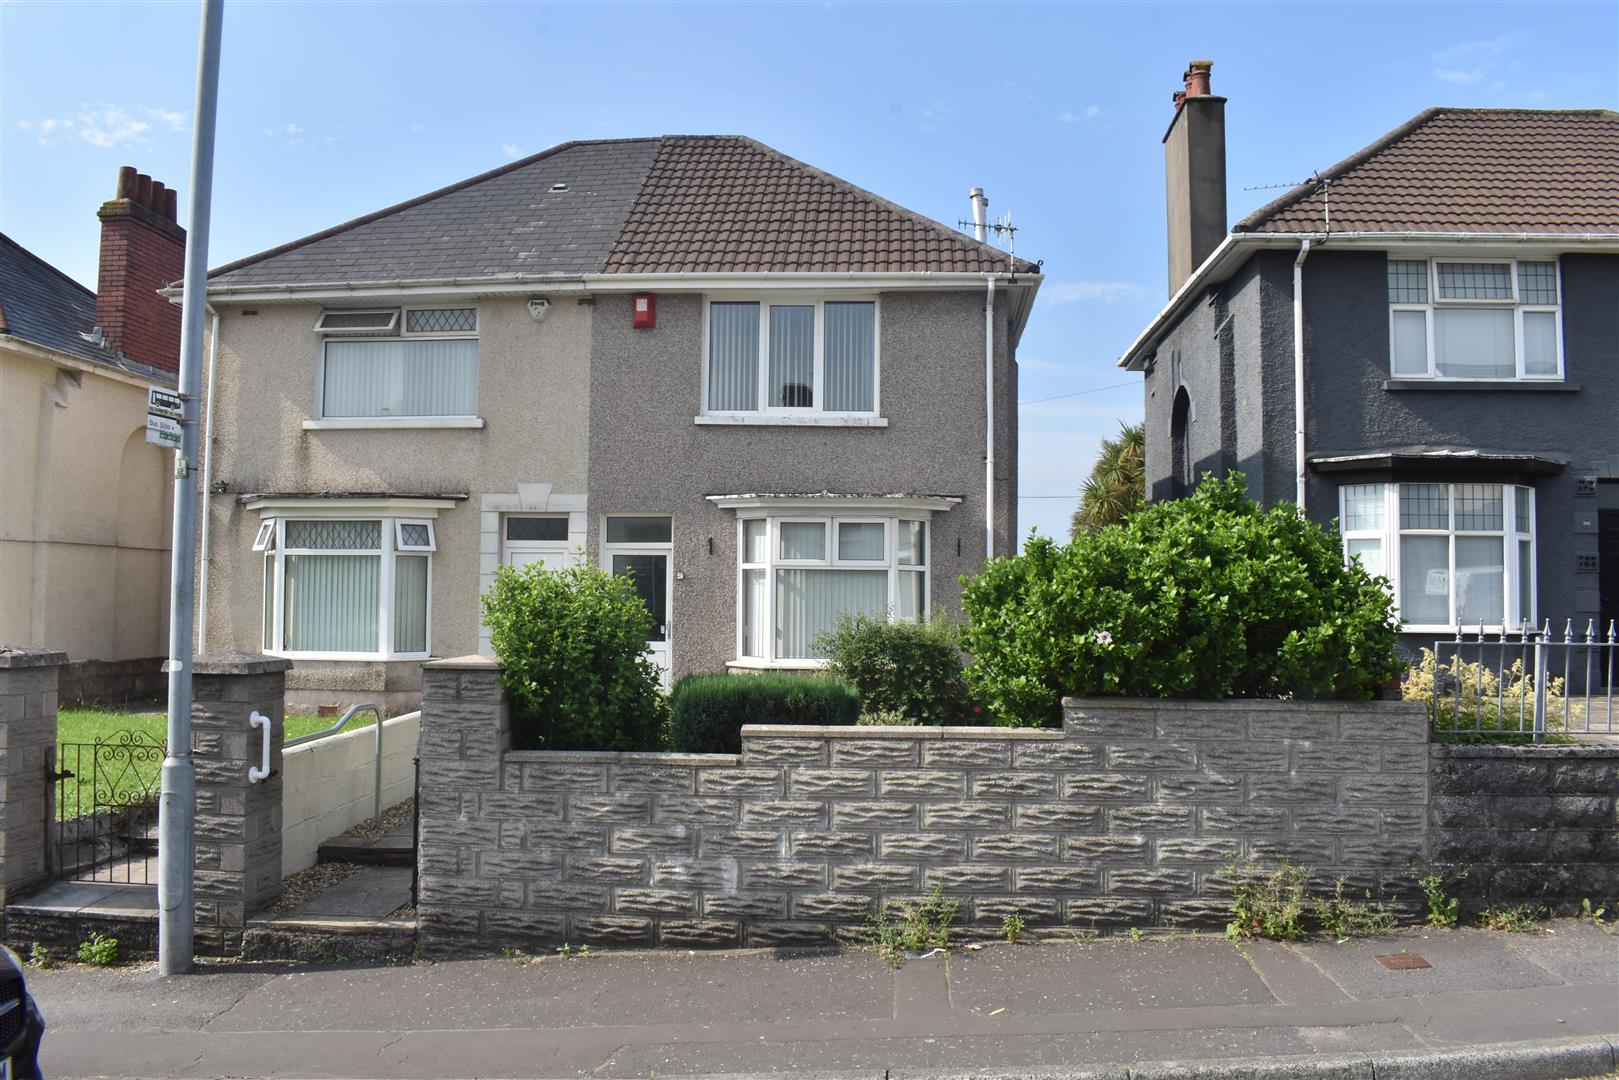 Tycoch Road, Sketty, Swansea, SA2 9EG